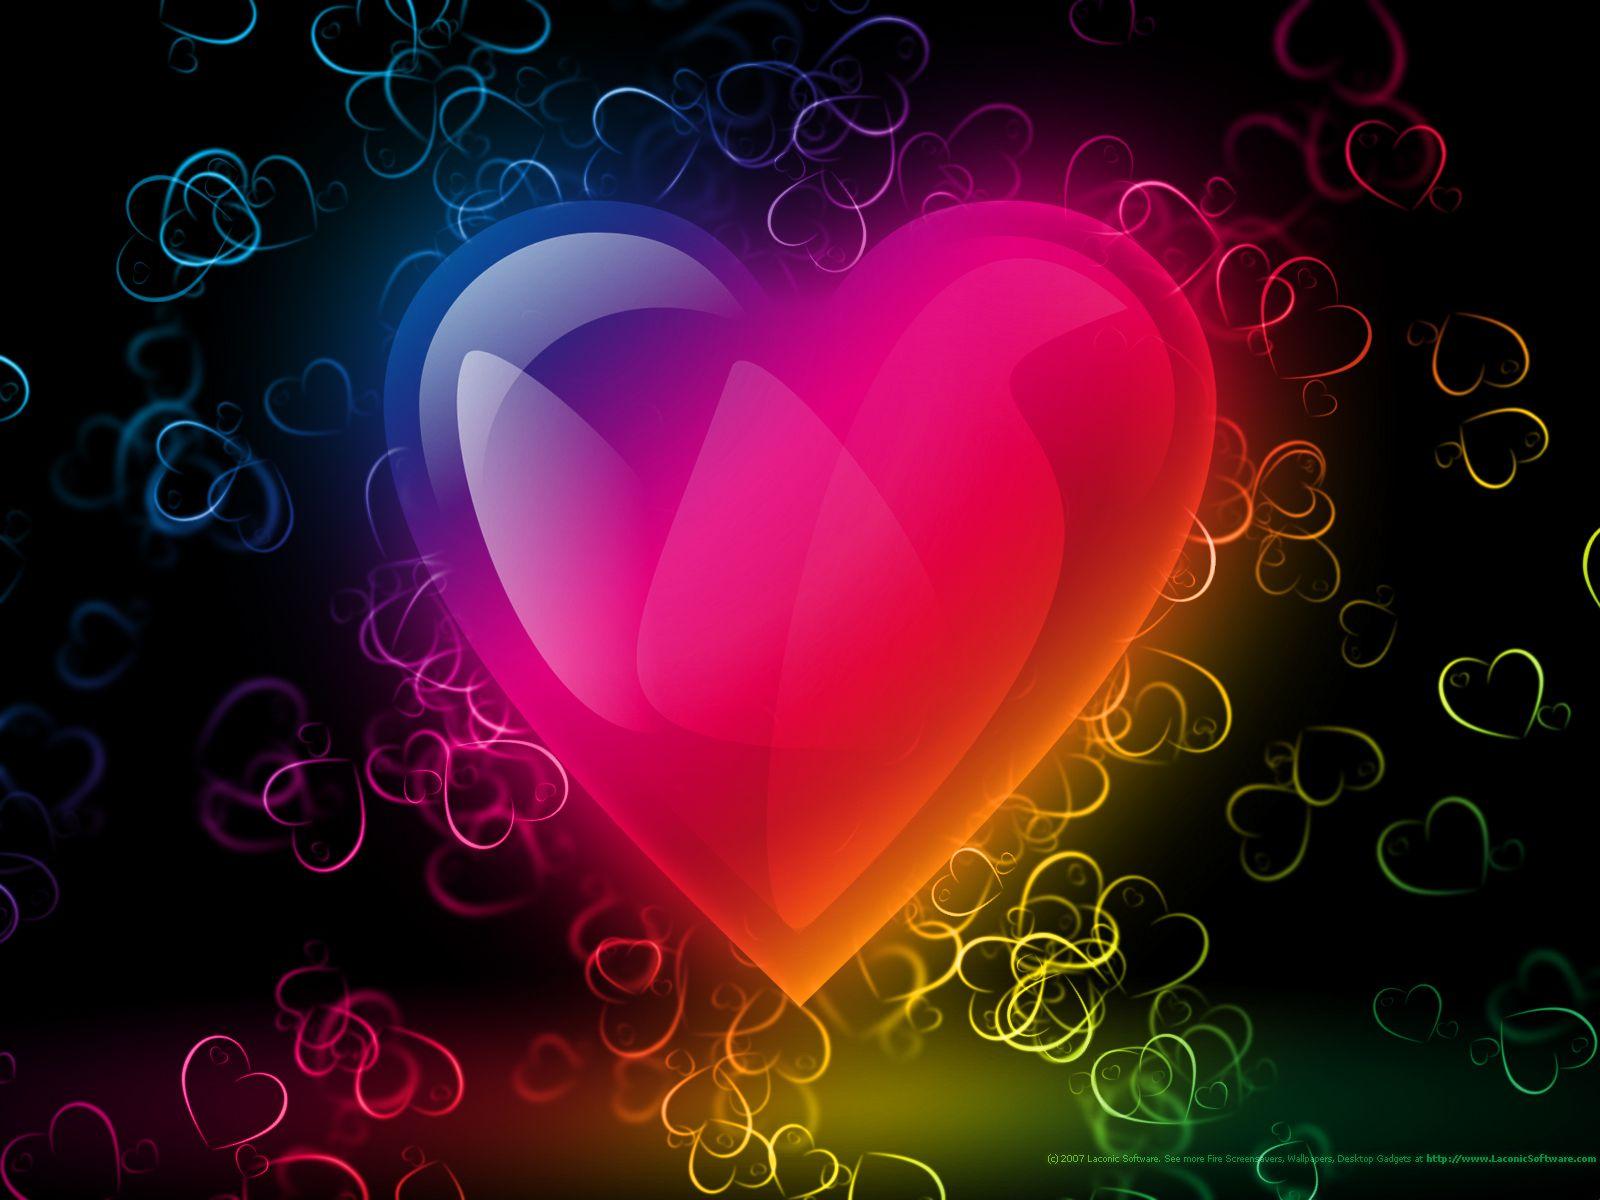 Картинки много ярких сердечек